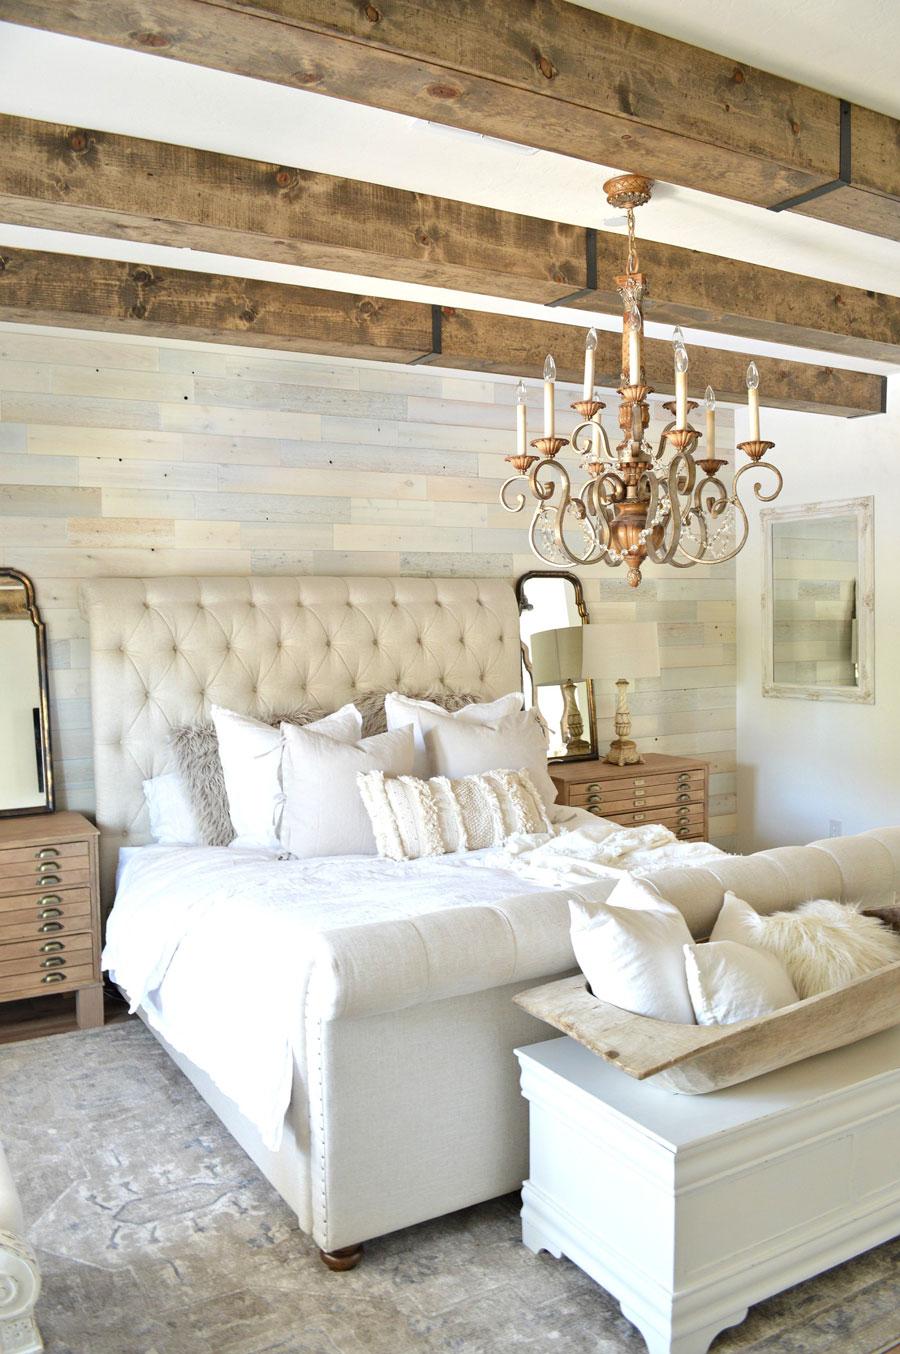 decorative-brown-wood-beams-10